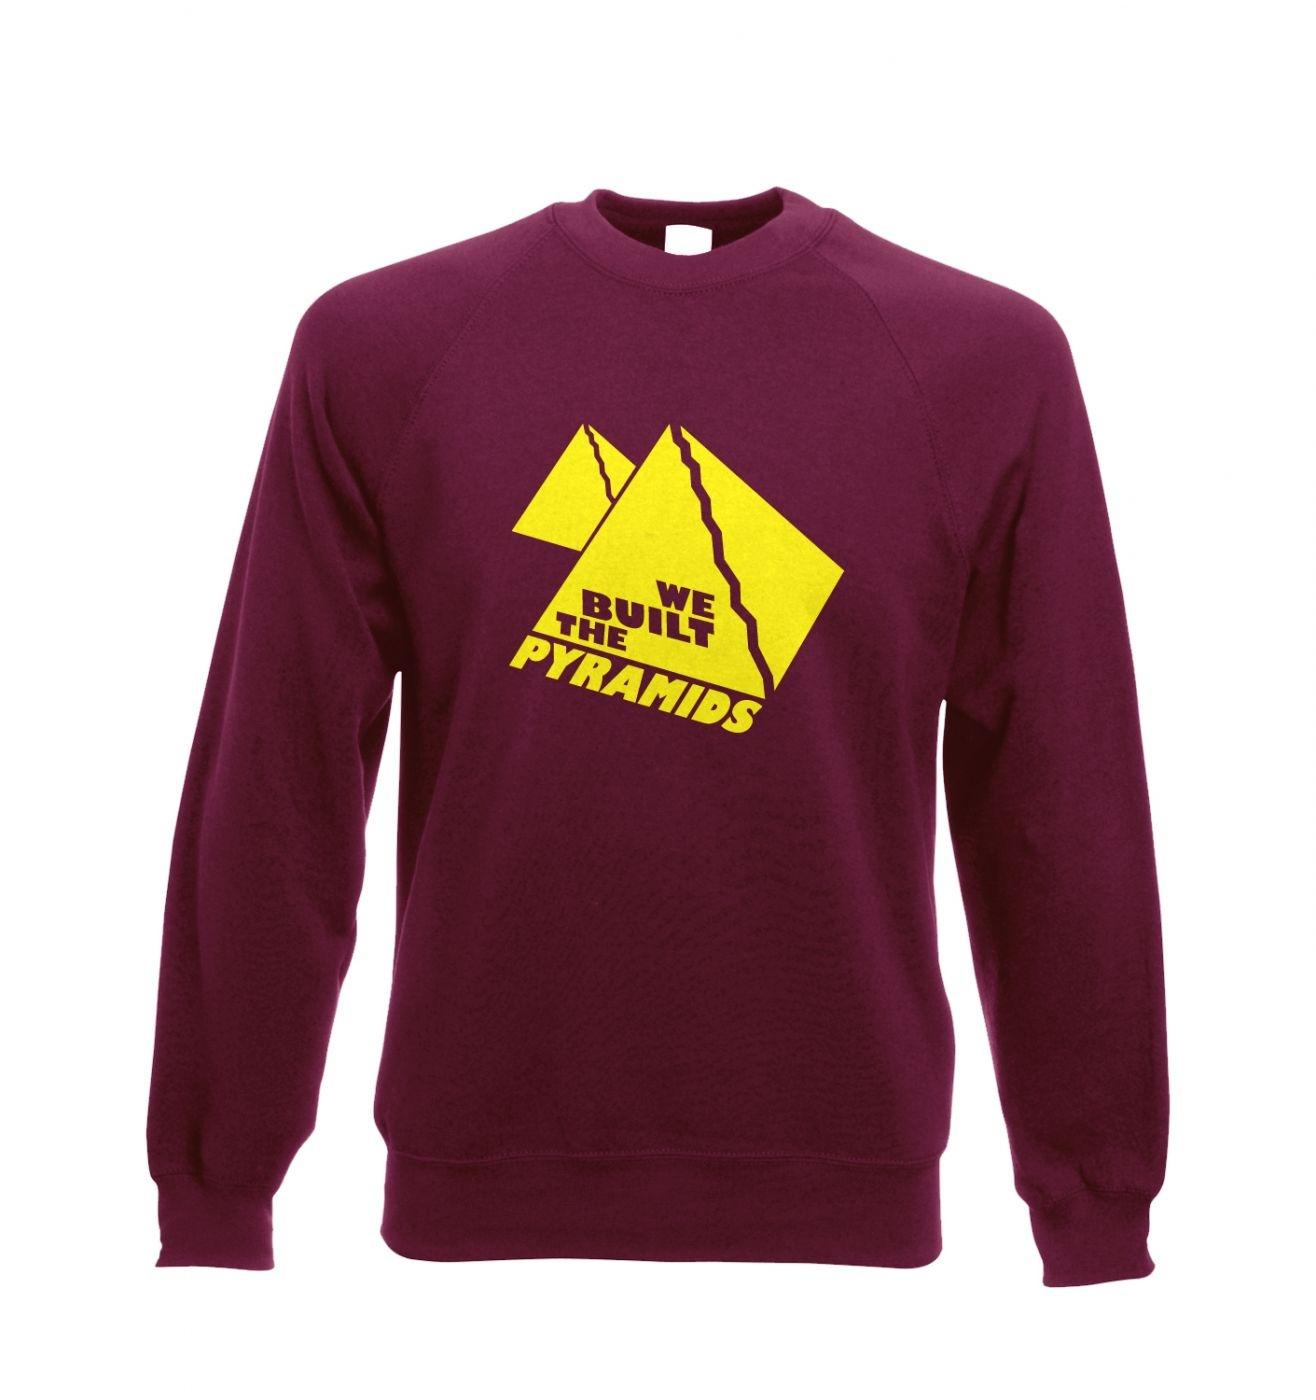 We Built The Pyramids Adult Crewneck Sweatshirt